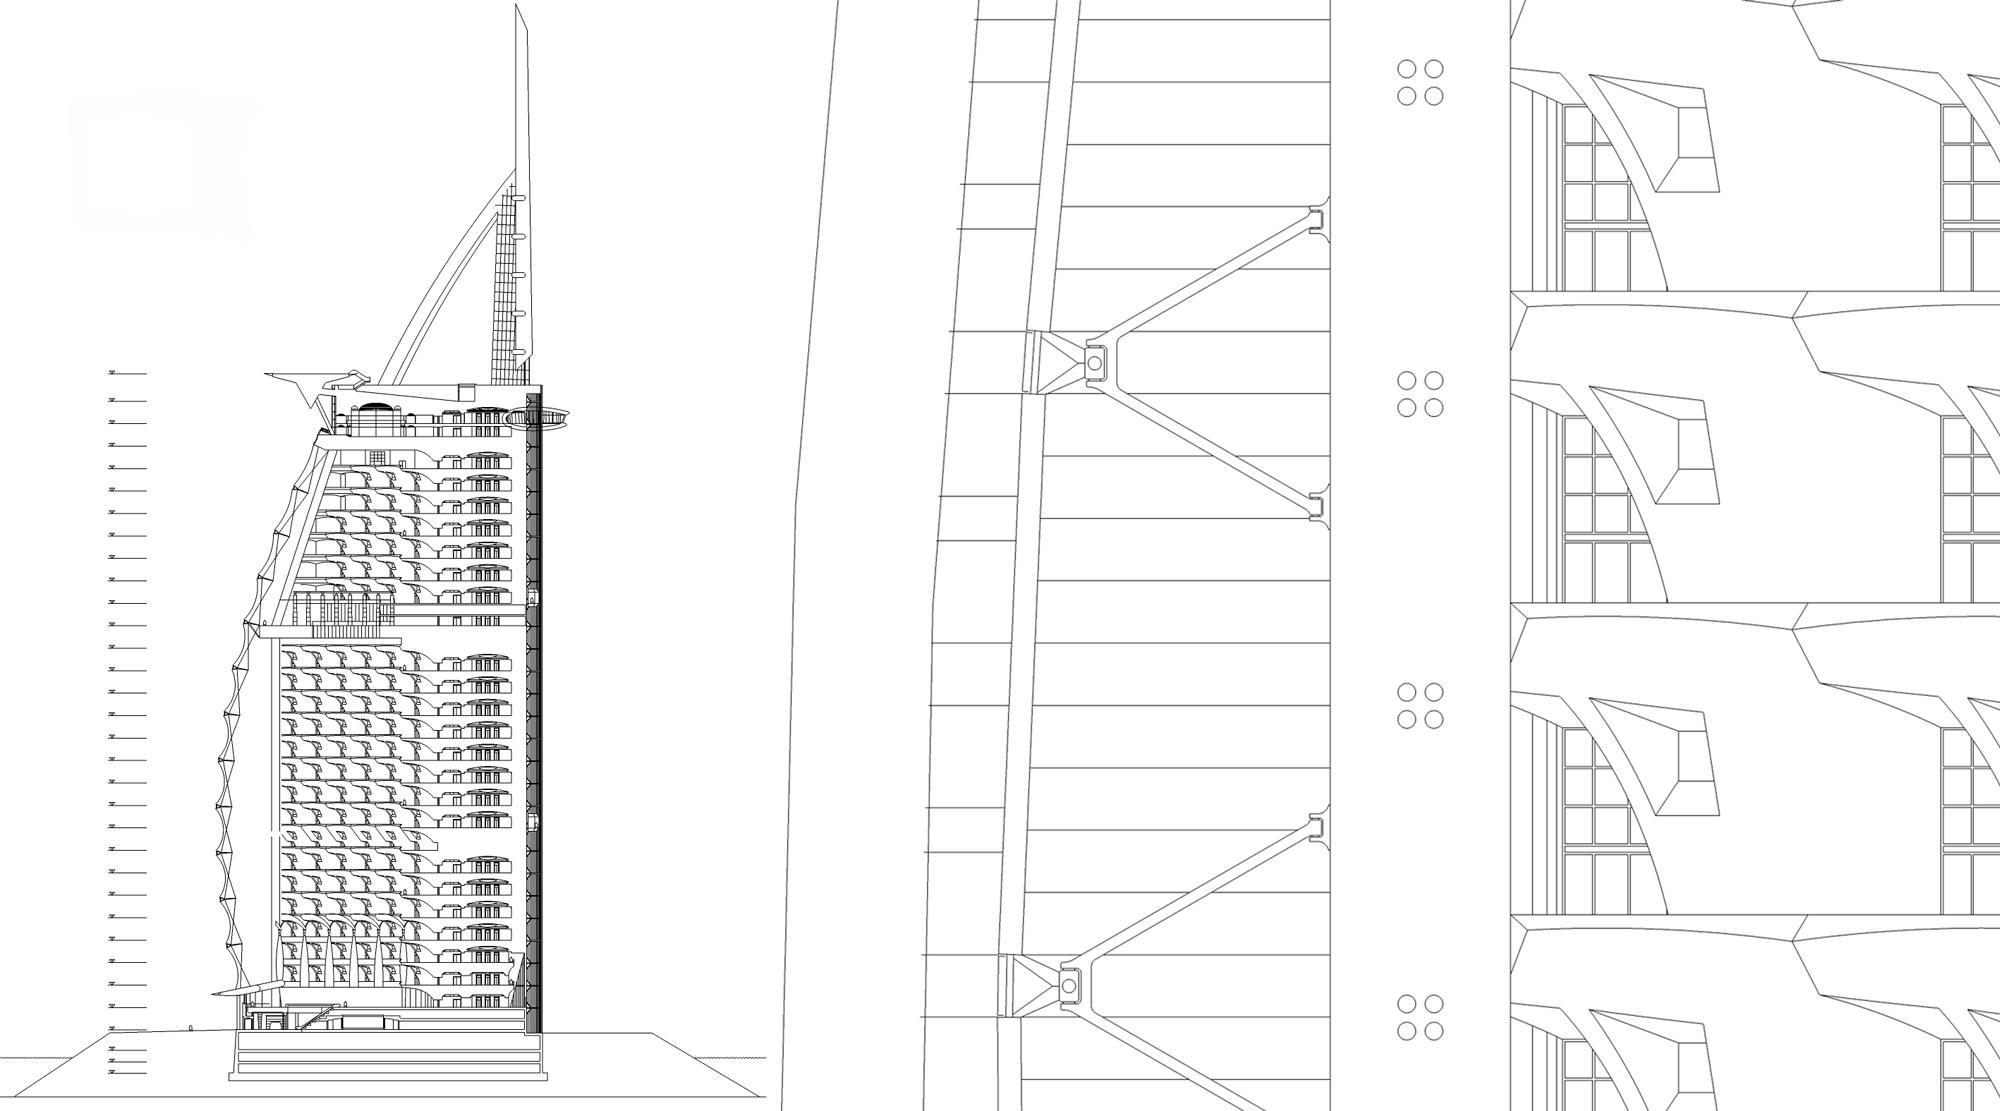 Burj Al Arab Section WKK copy.jpg